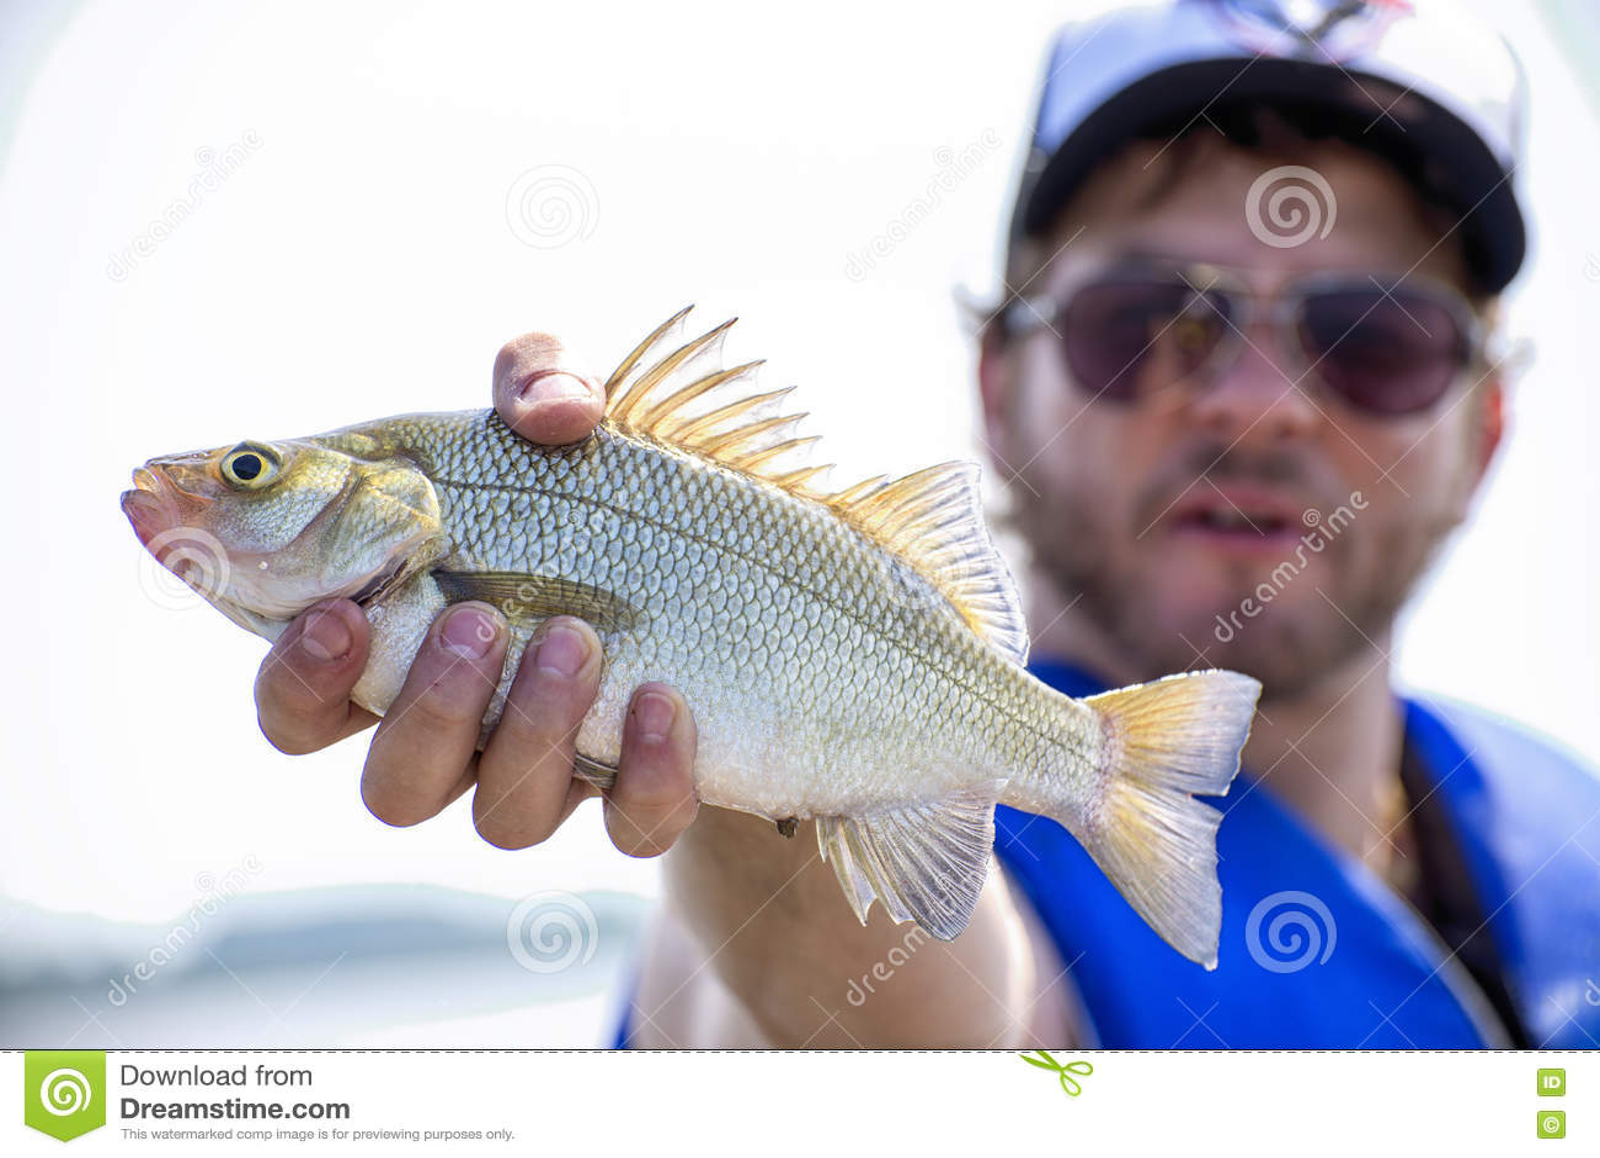 Fisherman with freshly caught freshwater drum fish